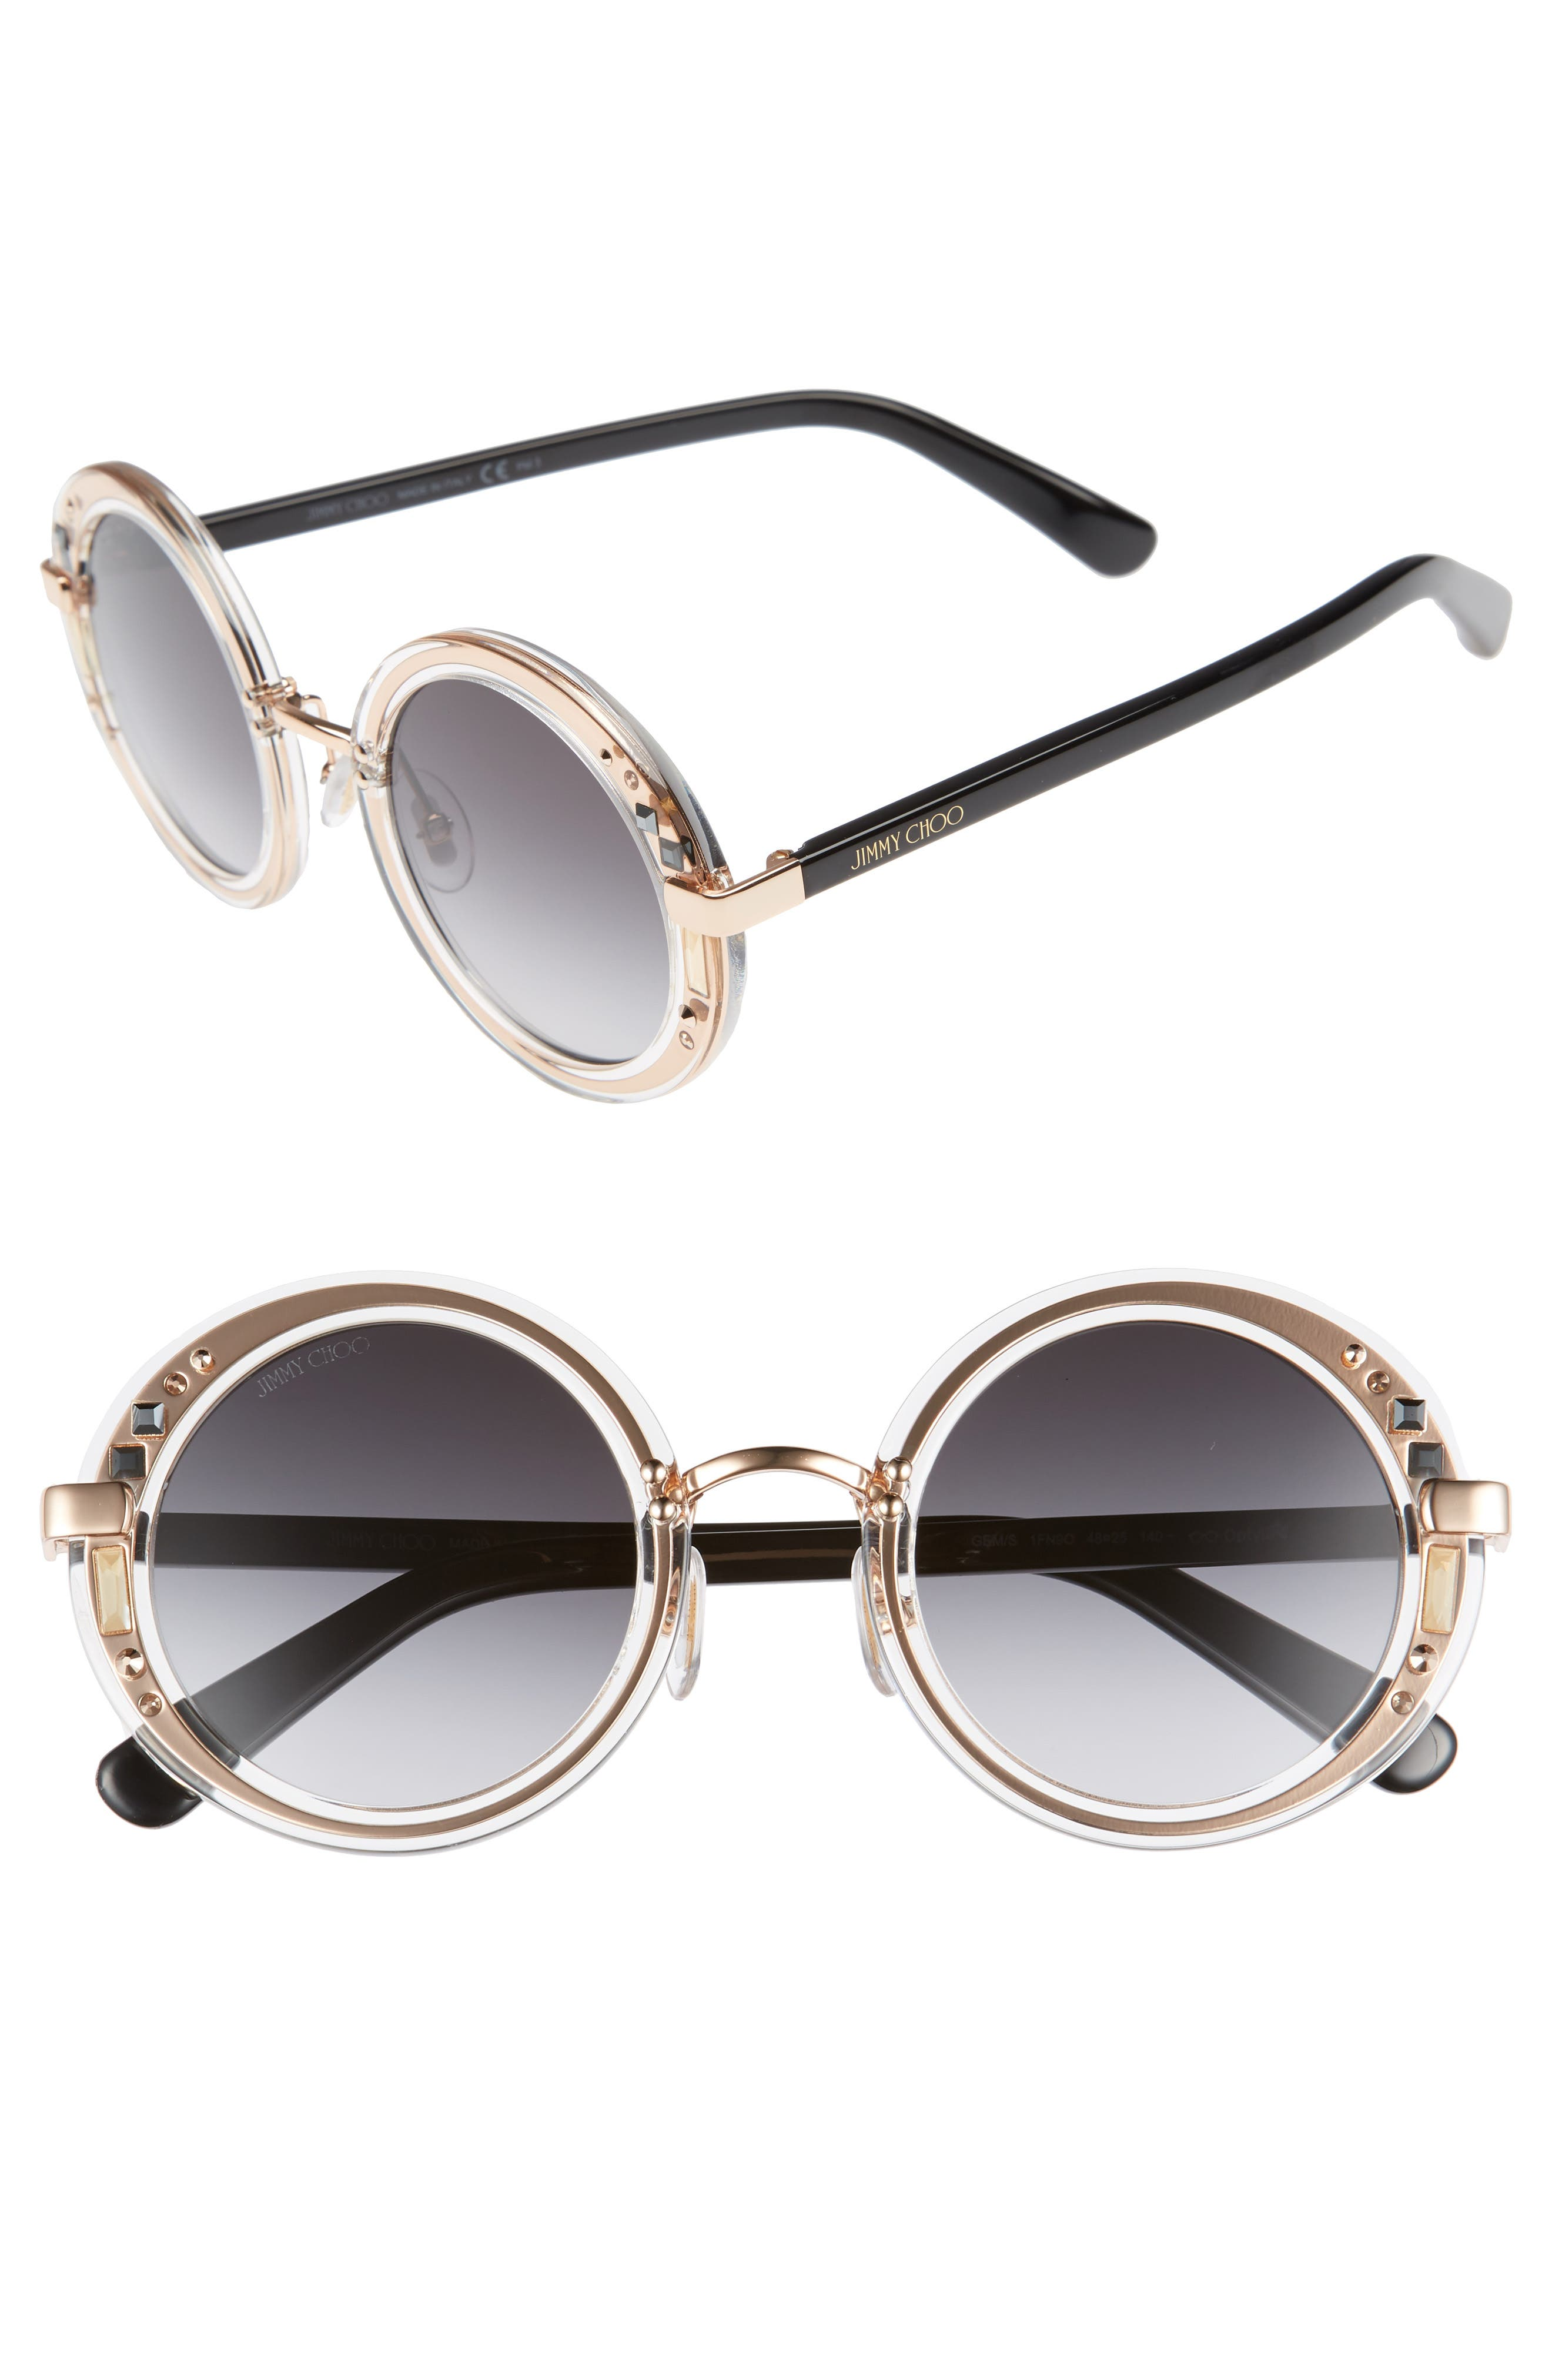 Gems 48mm Round Sunglasses,                         Main,                         color, 100